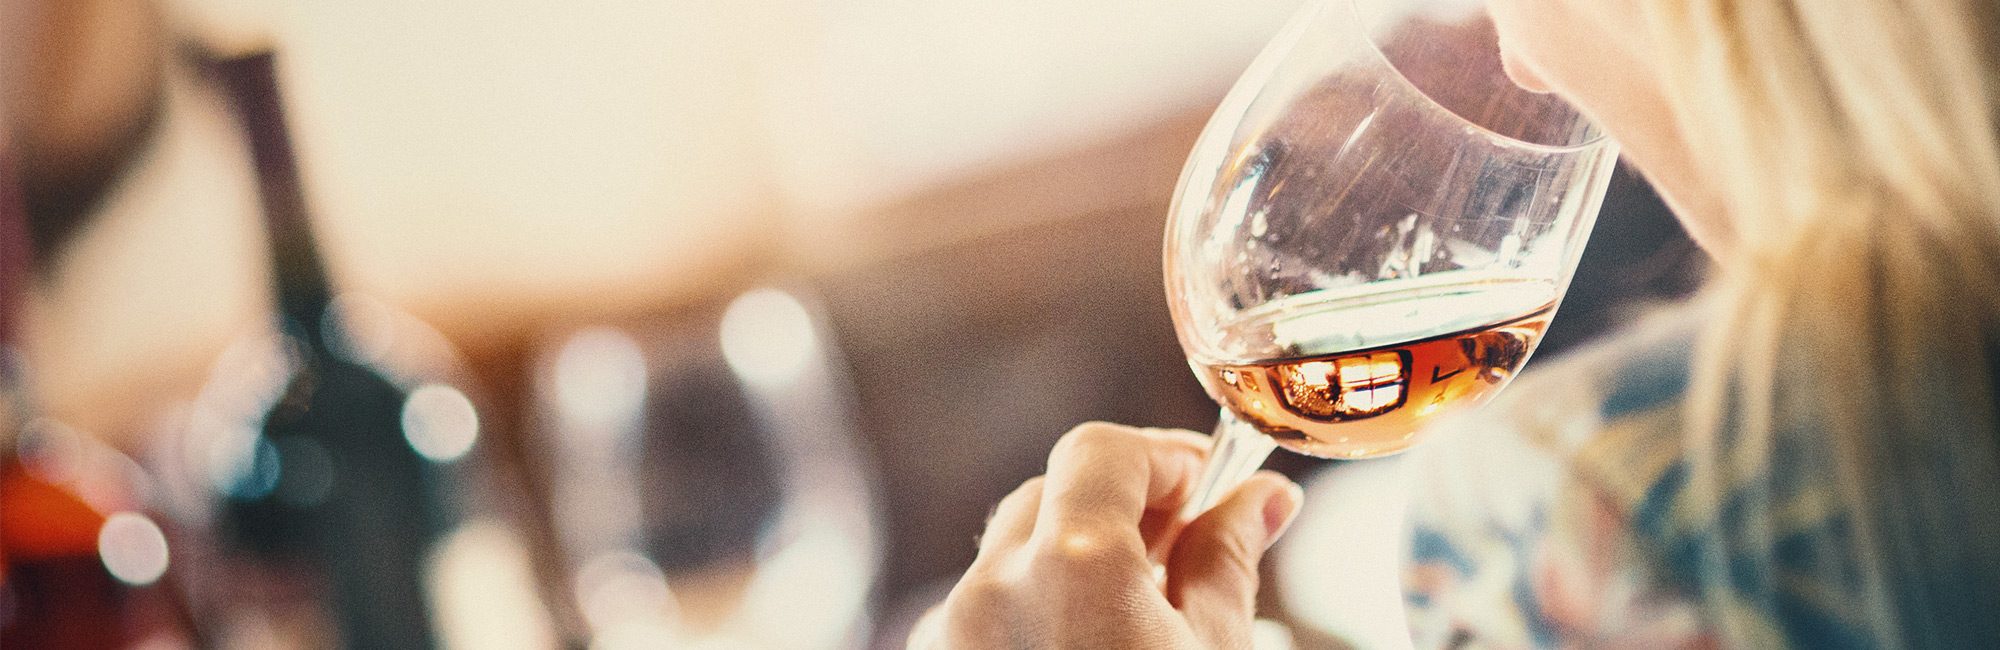 Agence Class Vins Conseils | Bar Éphémère | Gladys et Maturin - contact -33